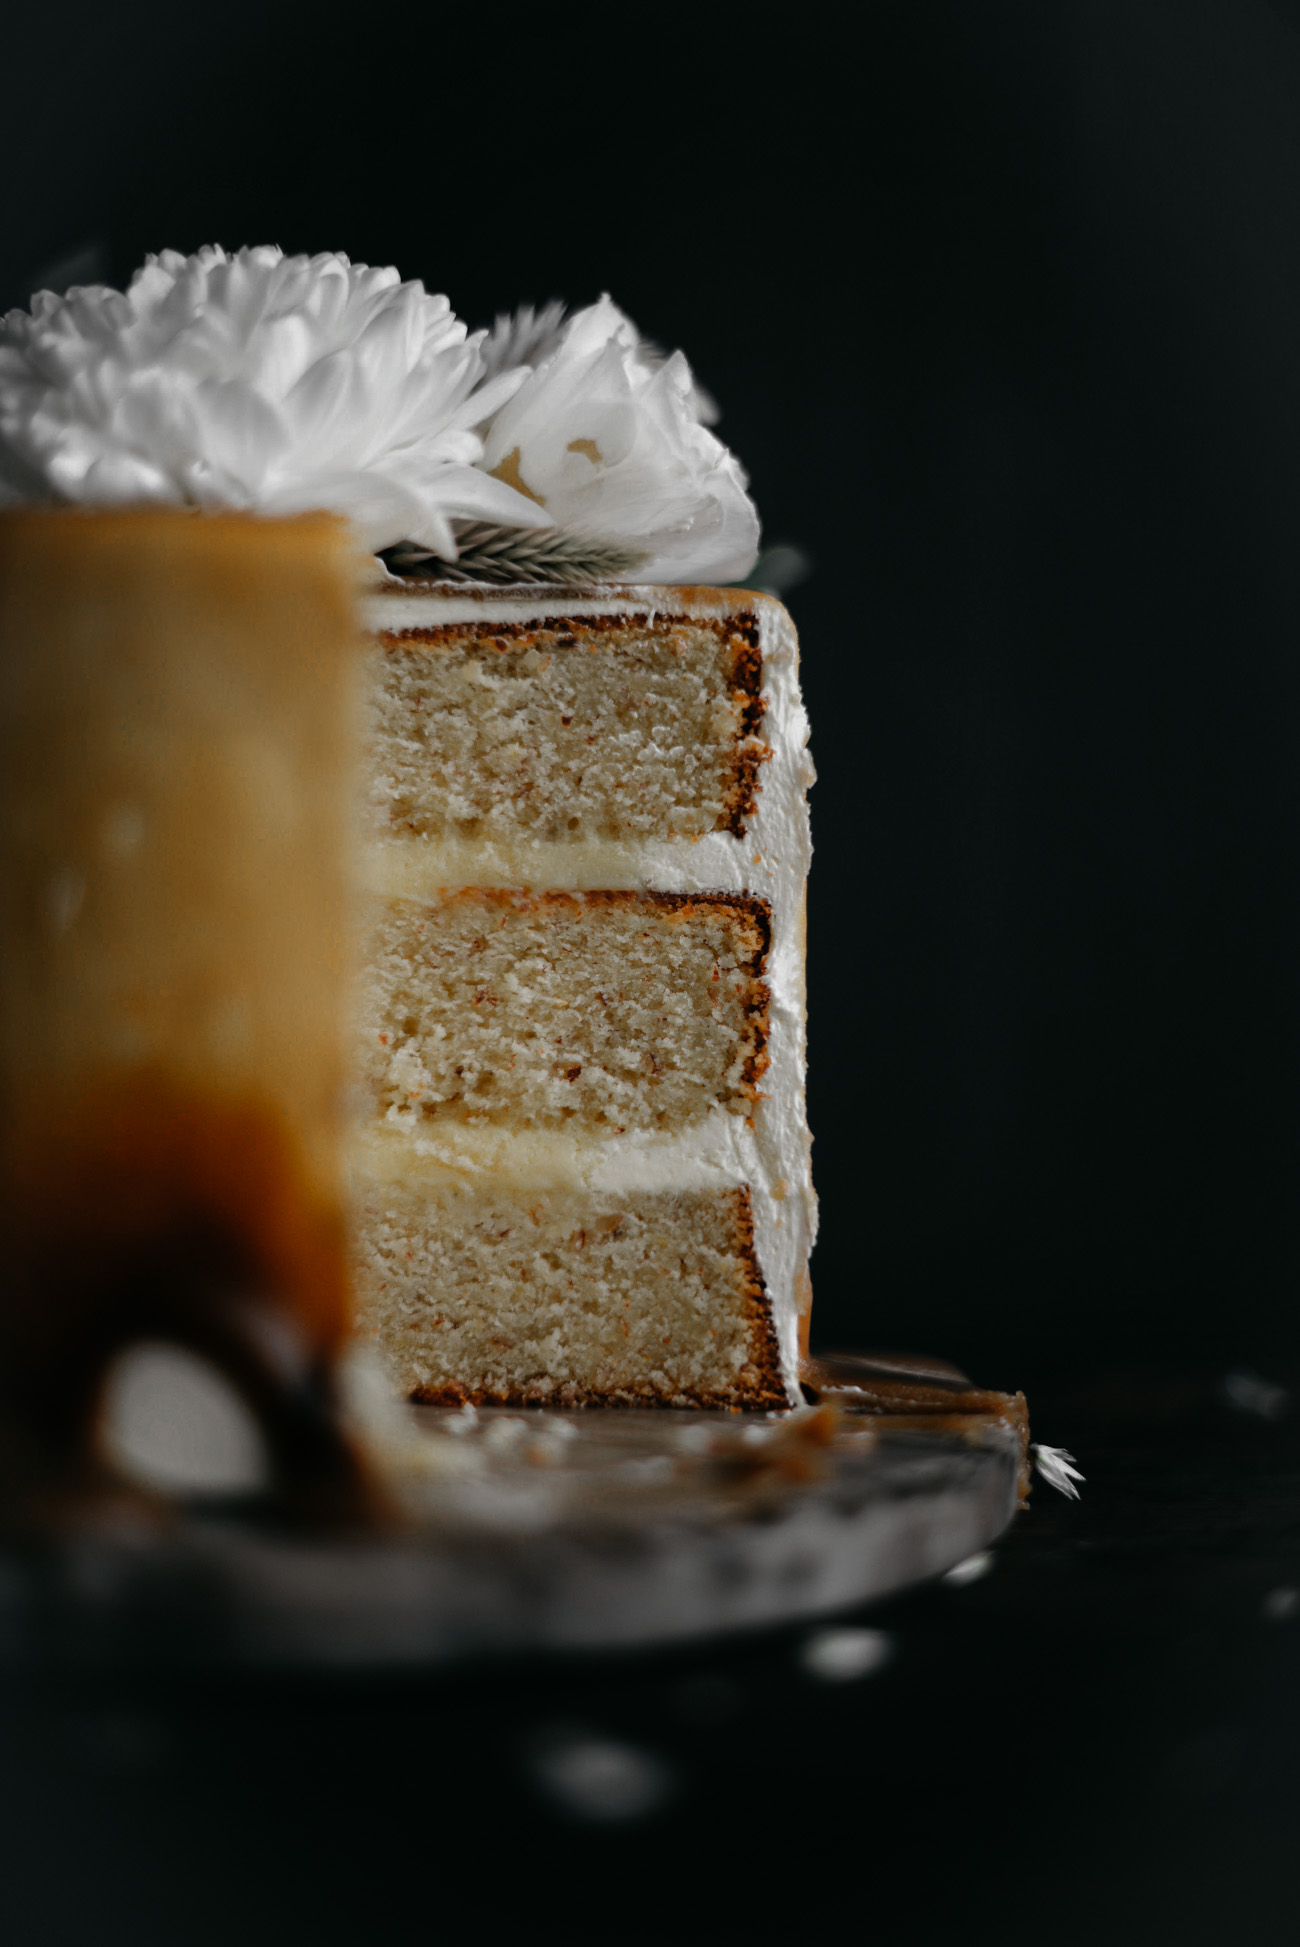 Italian-Orange-Blossom-and-Almond-Cake-with-Orange-Curd-Mascarpone-Swiss-Meringue-Buttercream-and-Fleur-d'Oranger-Caramel-13.jpg